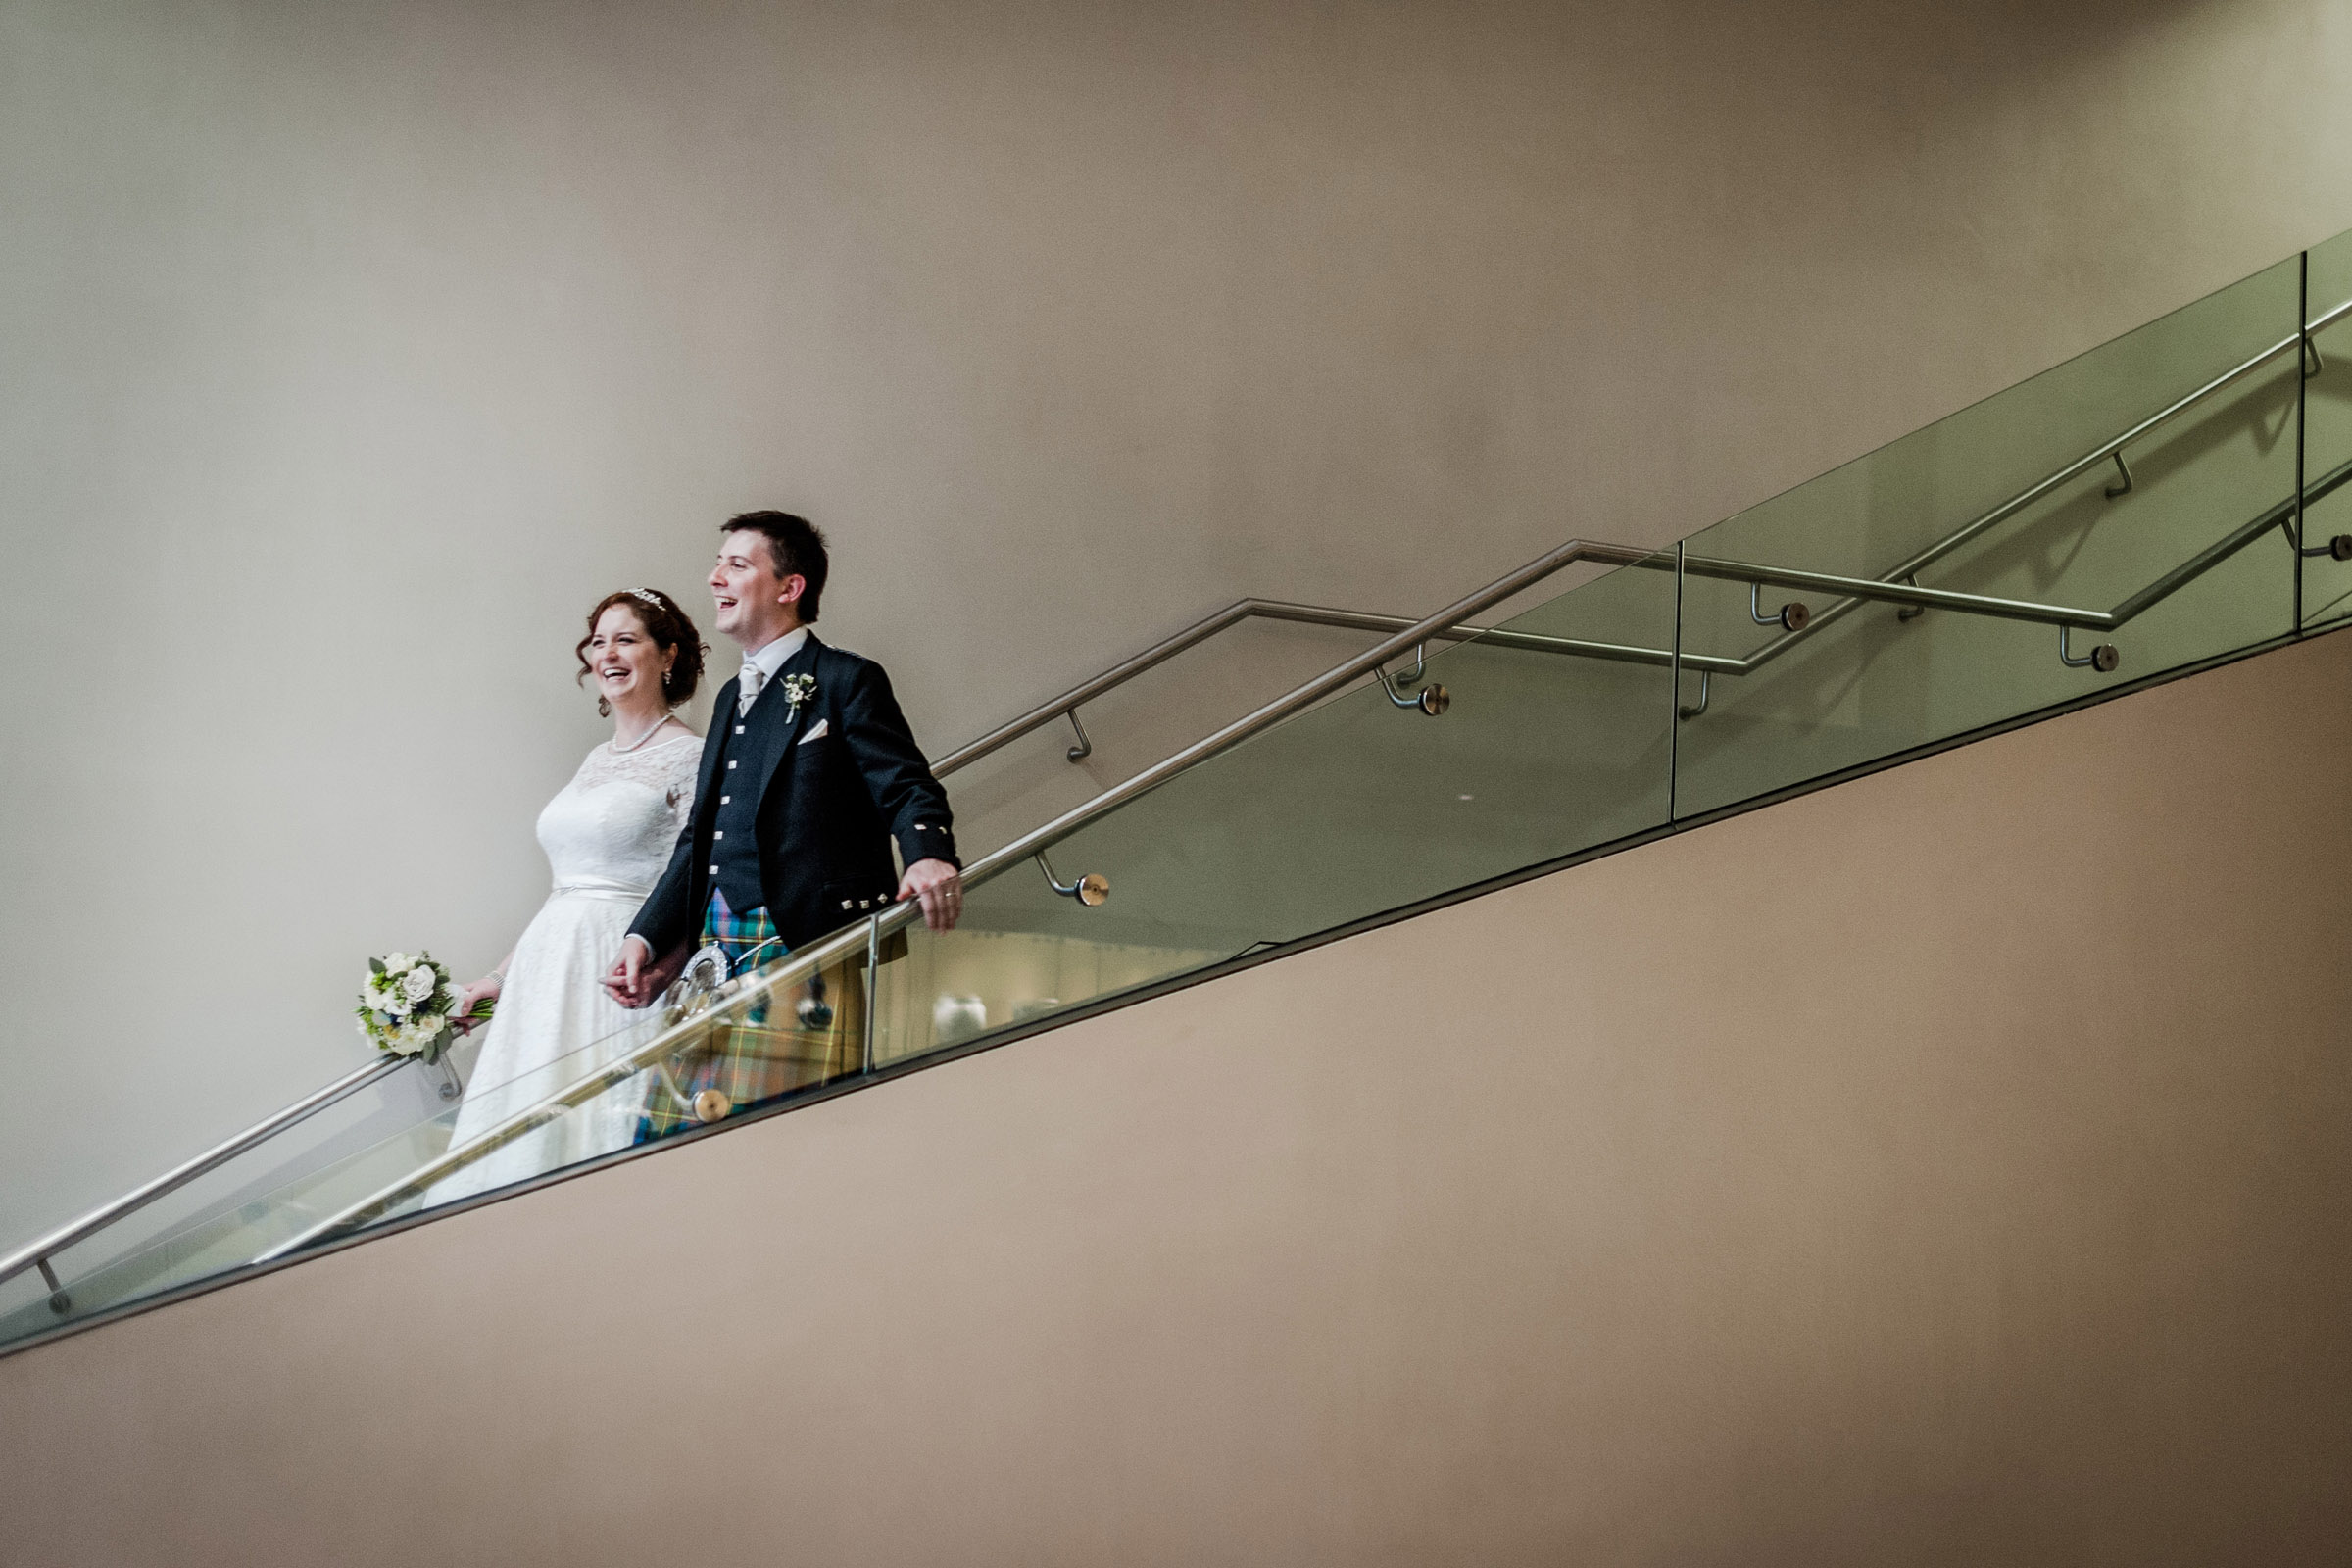 Ashmolean-Museum-Wedding-Pictures-0041.jpg